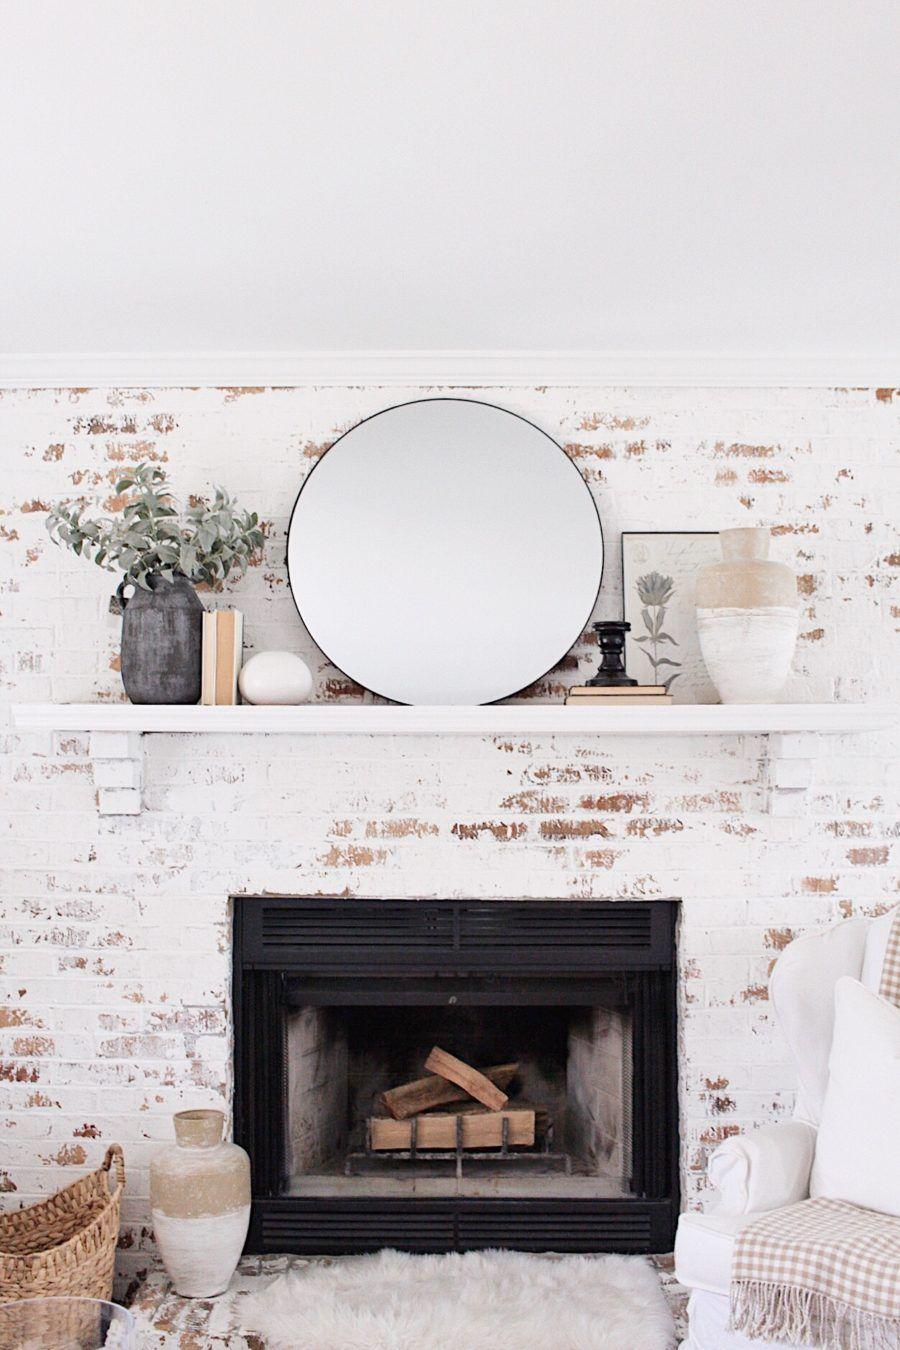 White Brick Fireplace Mantle Decor Ideas With Round Black Mirror